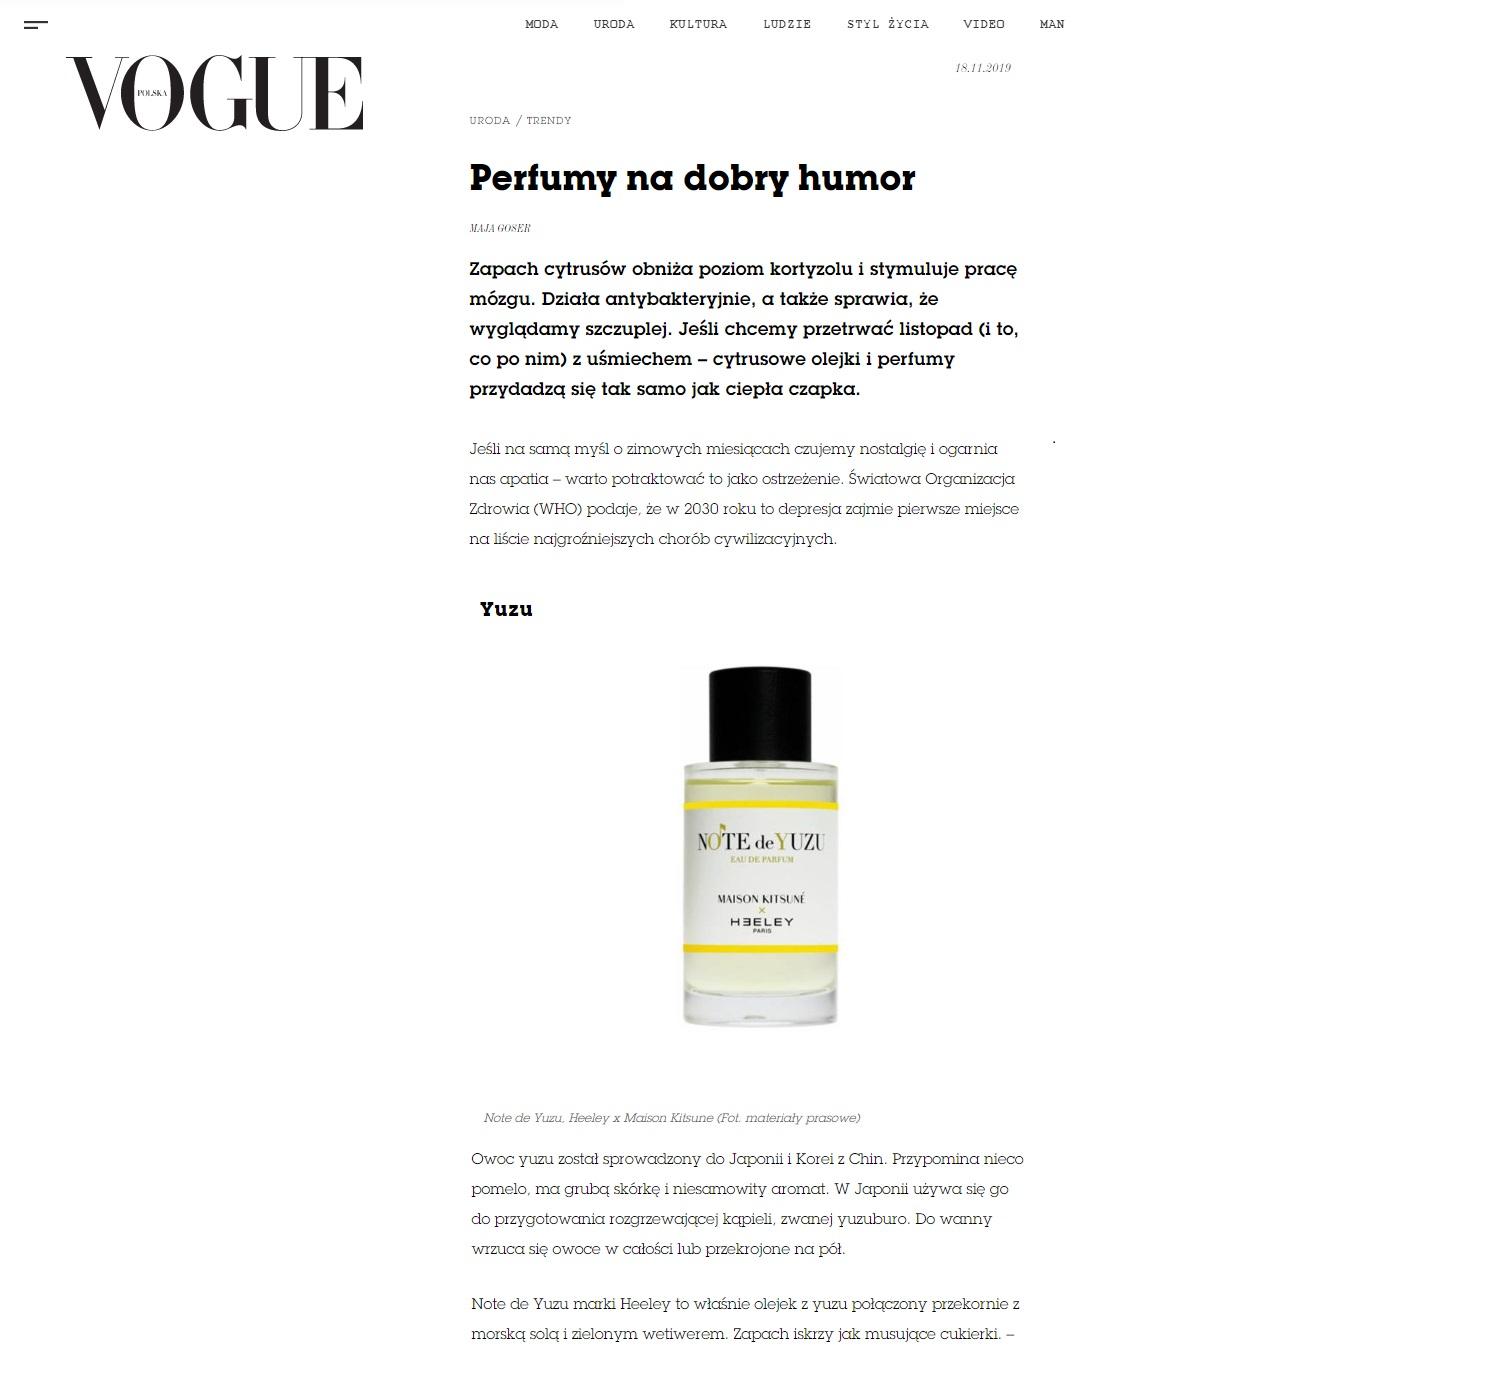 Note de Yuzu w Vogue Polska